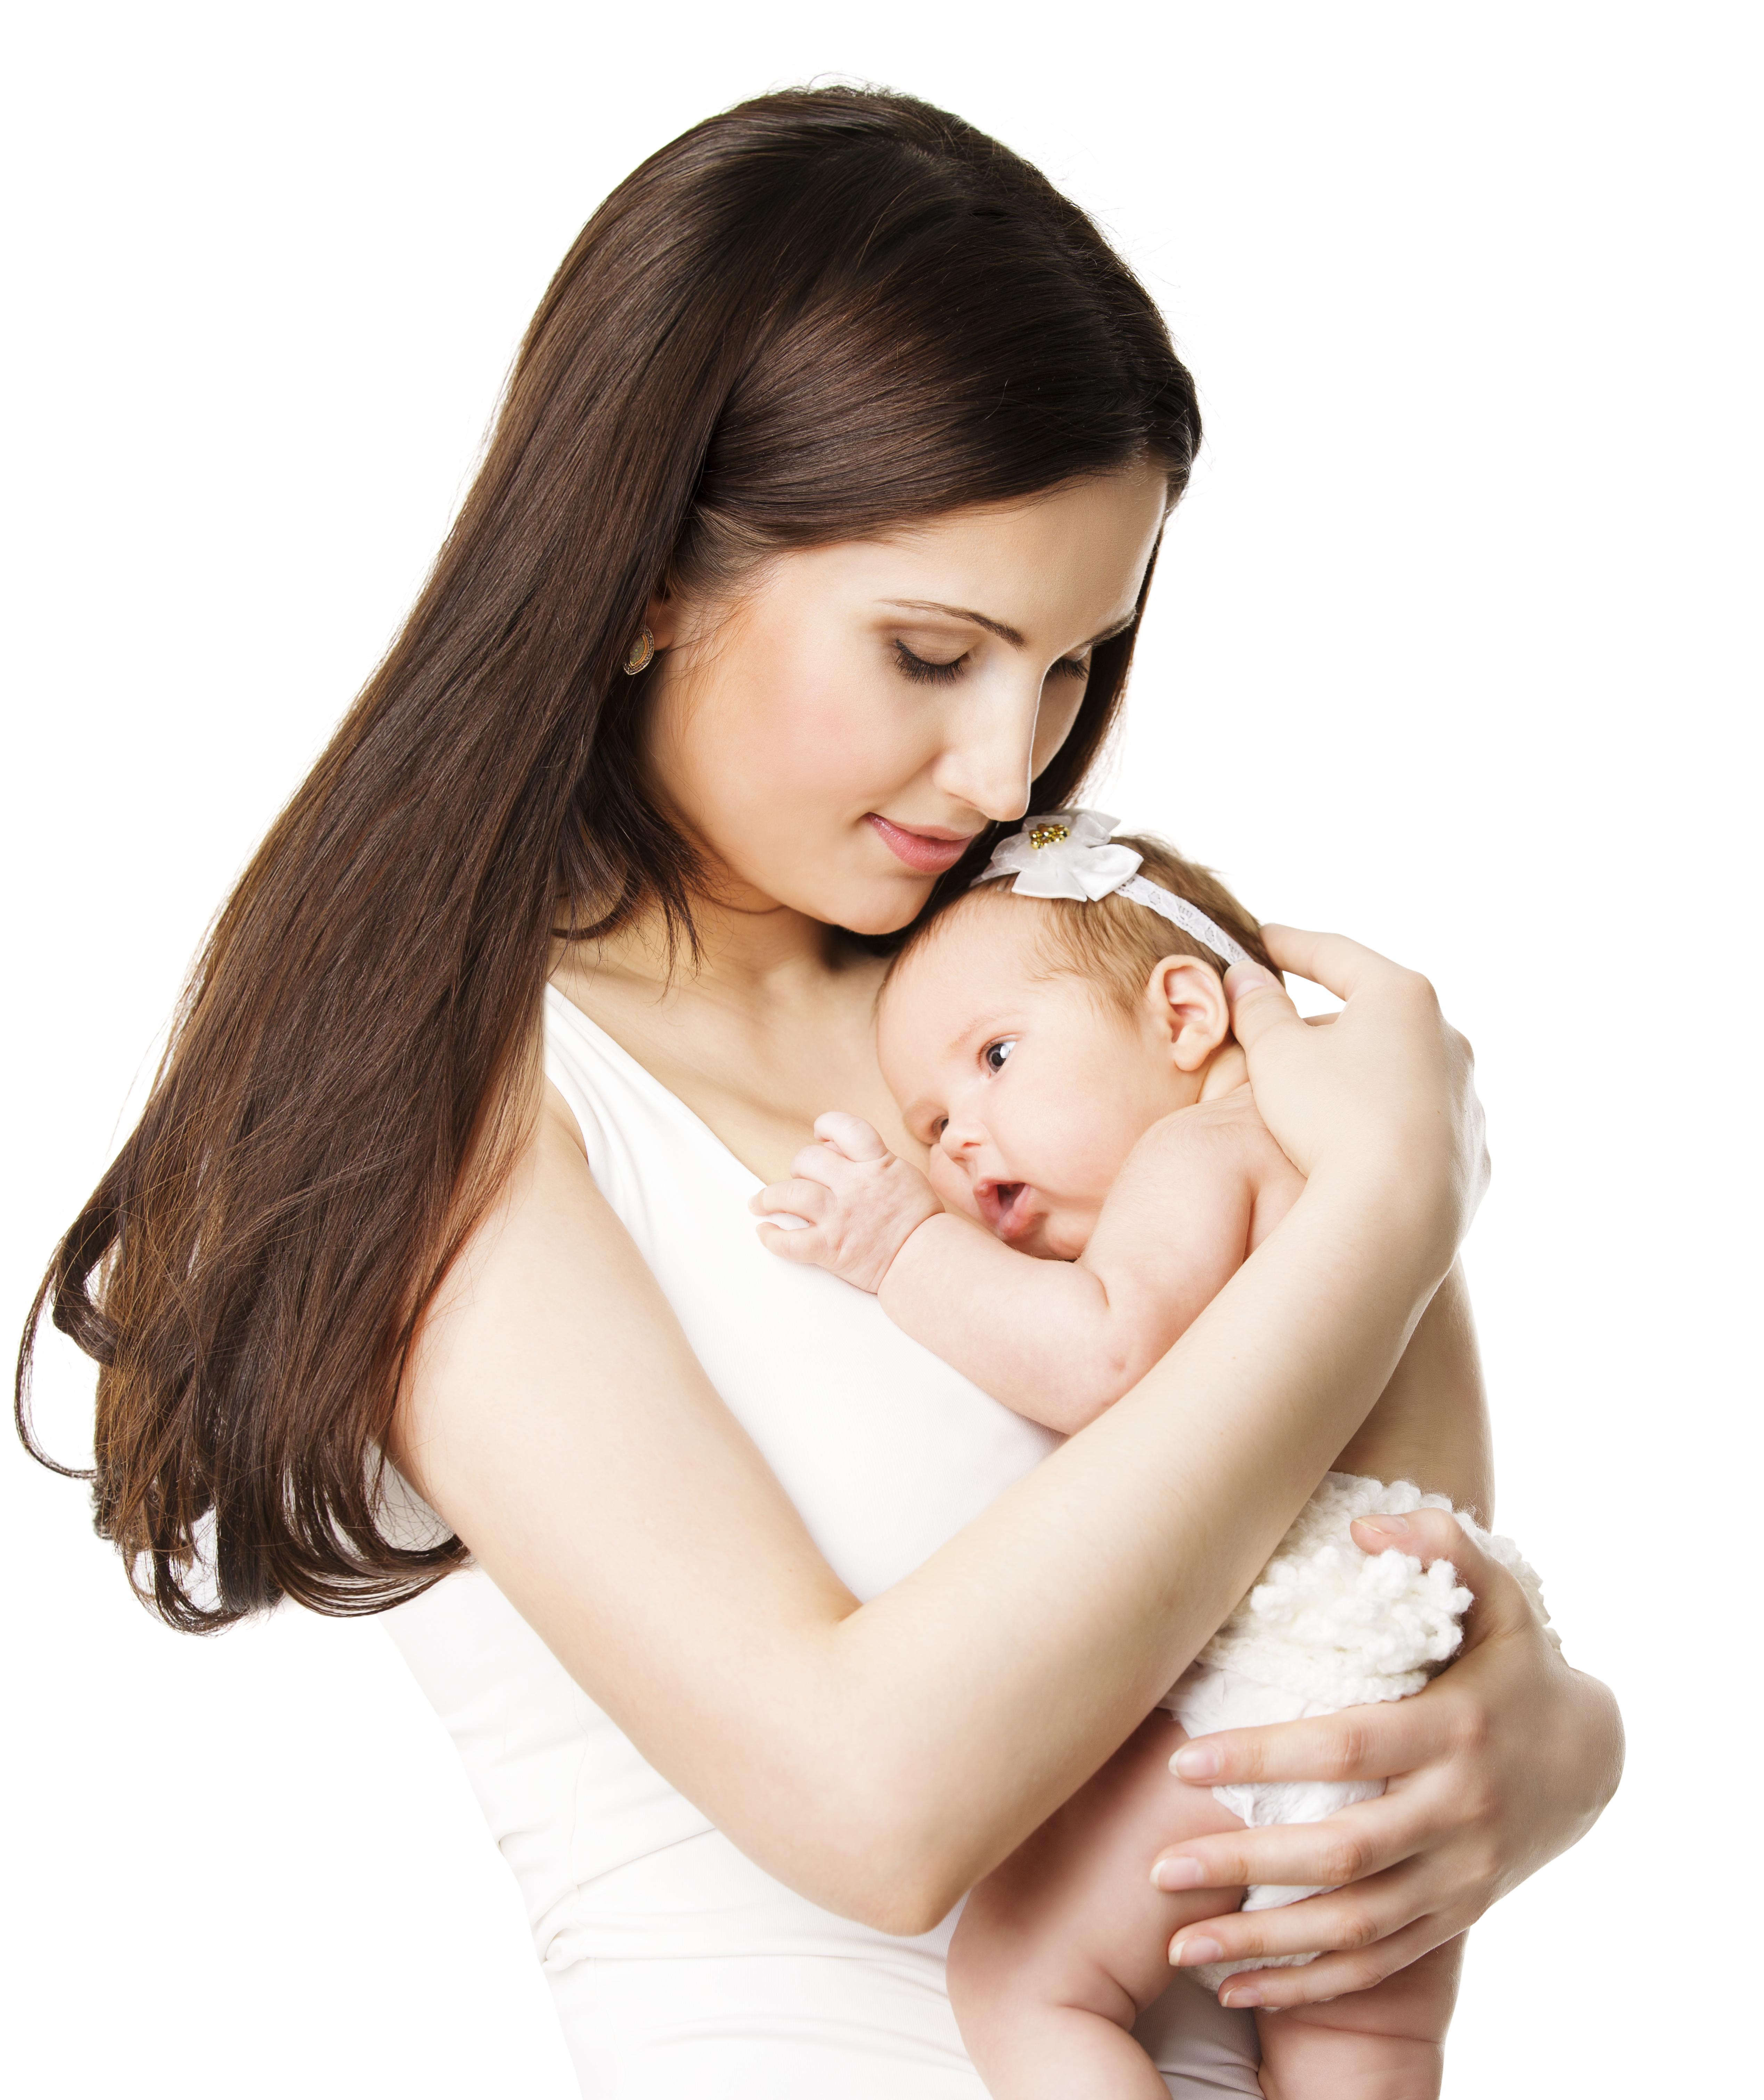 Mother Newborn Baby Family Portrait, Mom Embracing New BornKid